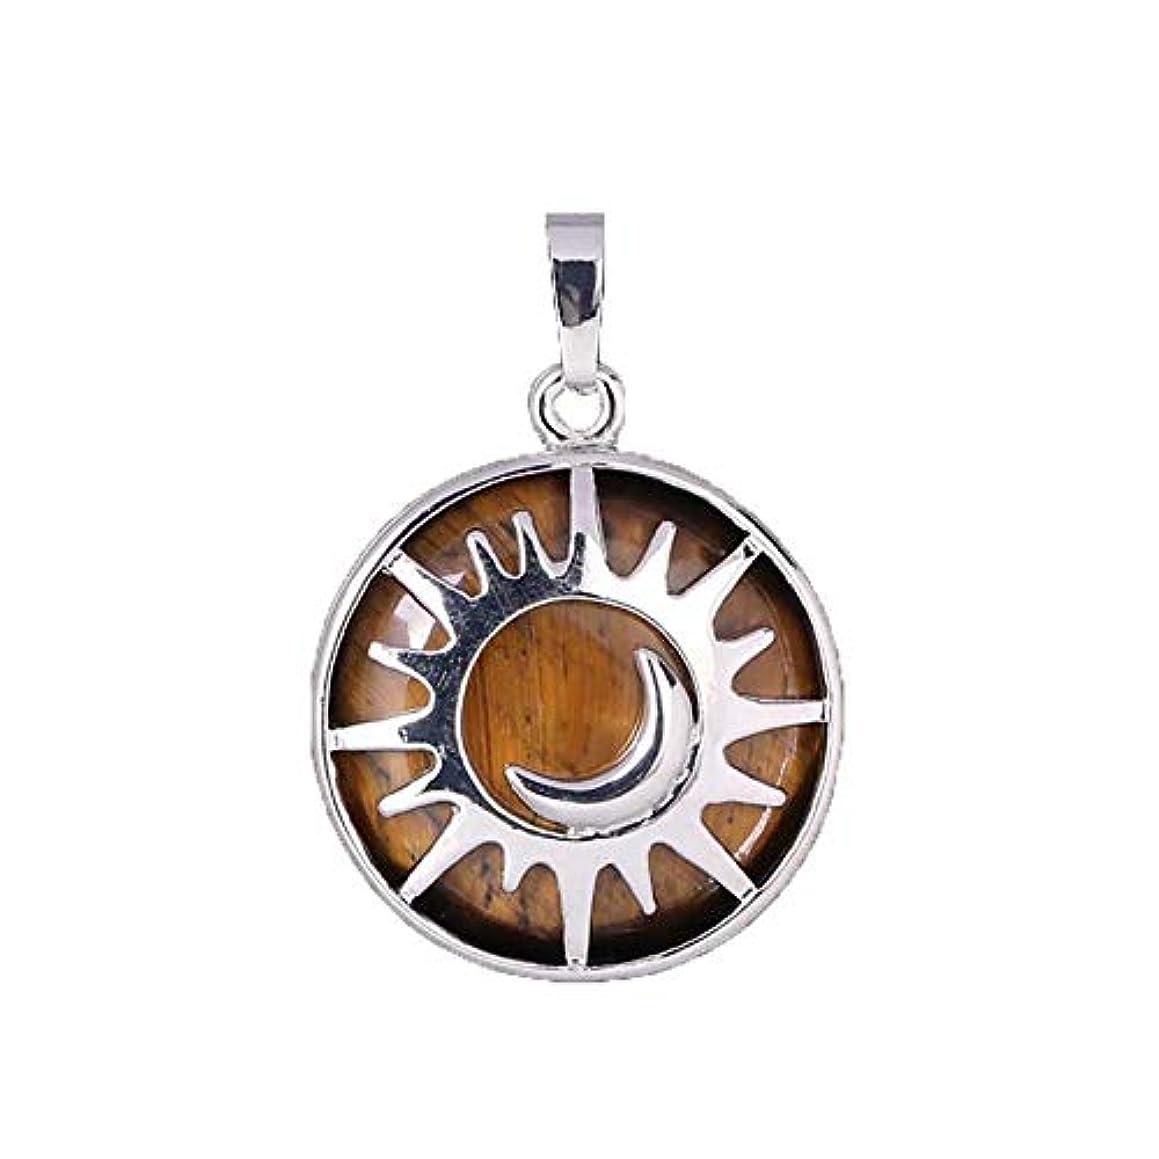 Sun & Moon Pendant Reiki Healing Natural Stone Purple White Crystal Quartz Beads For Jewelry Making Necklace Women Men